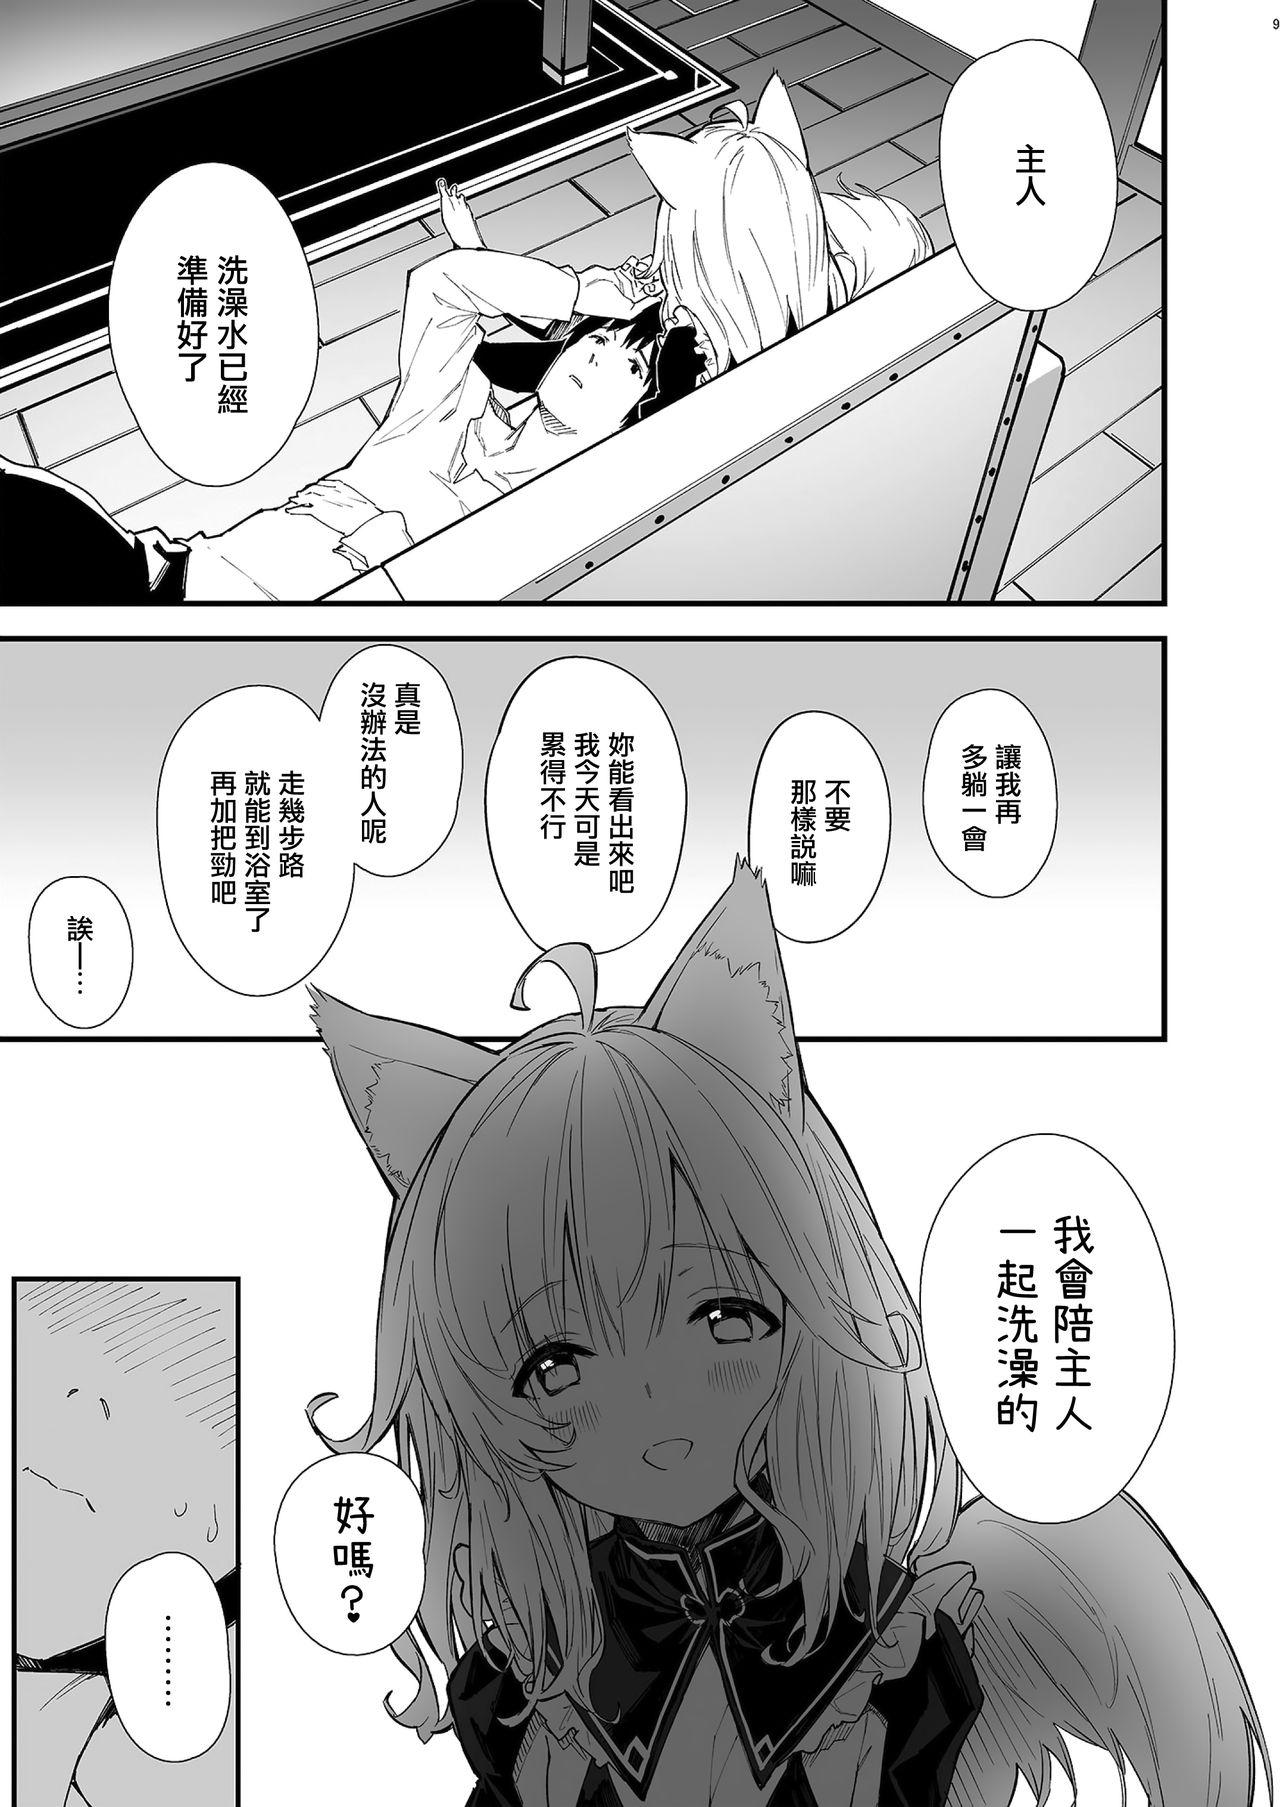 Kemomimi Maid to Ichaicha suru Hon 7